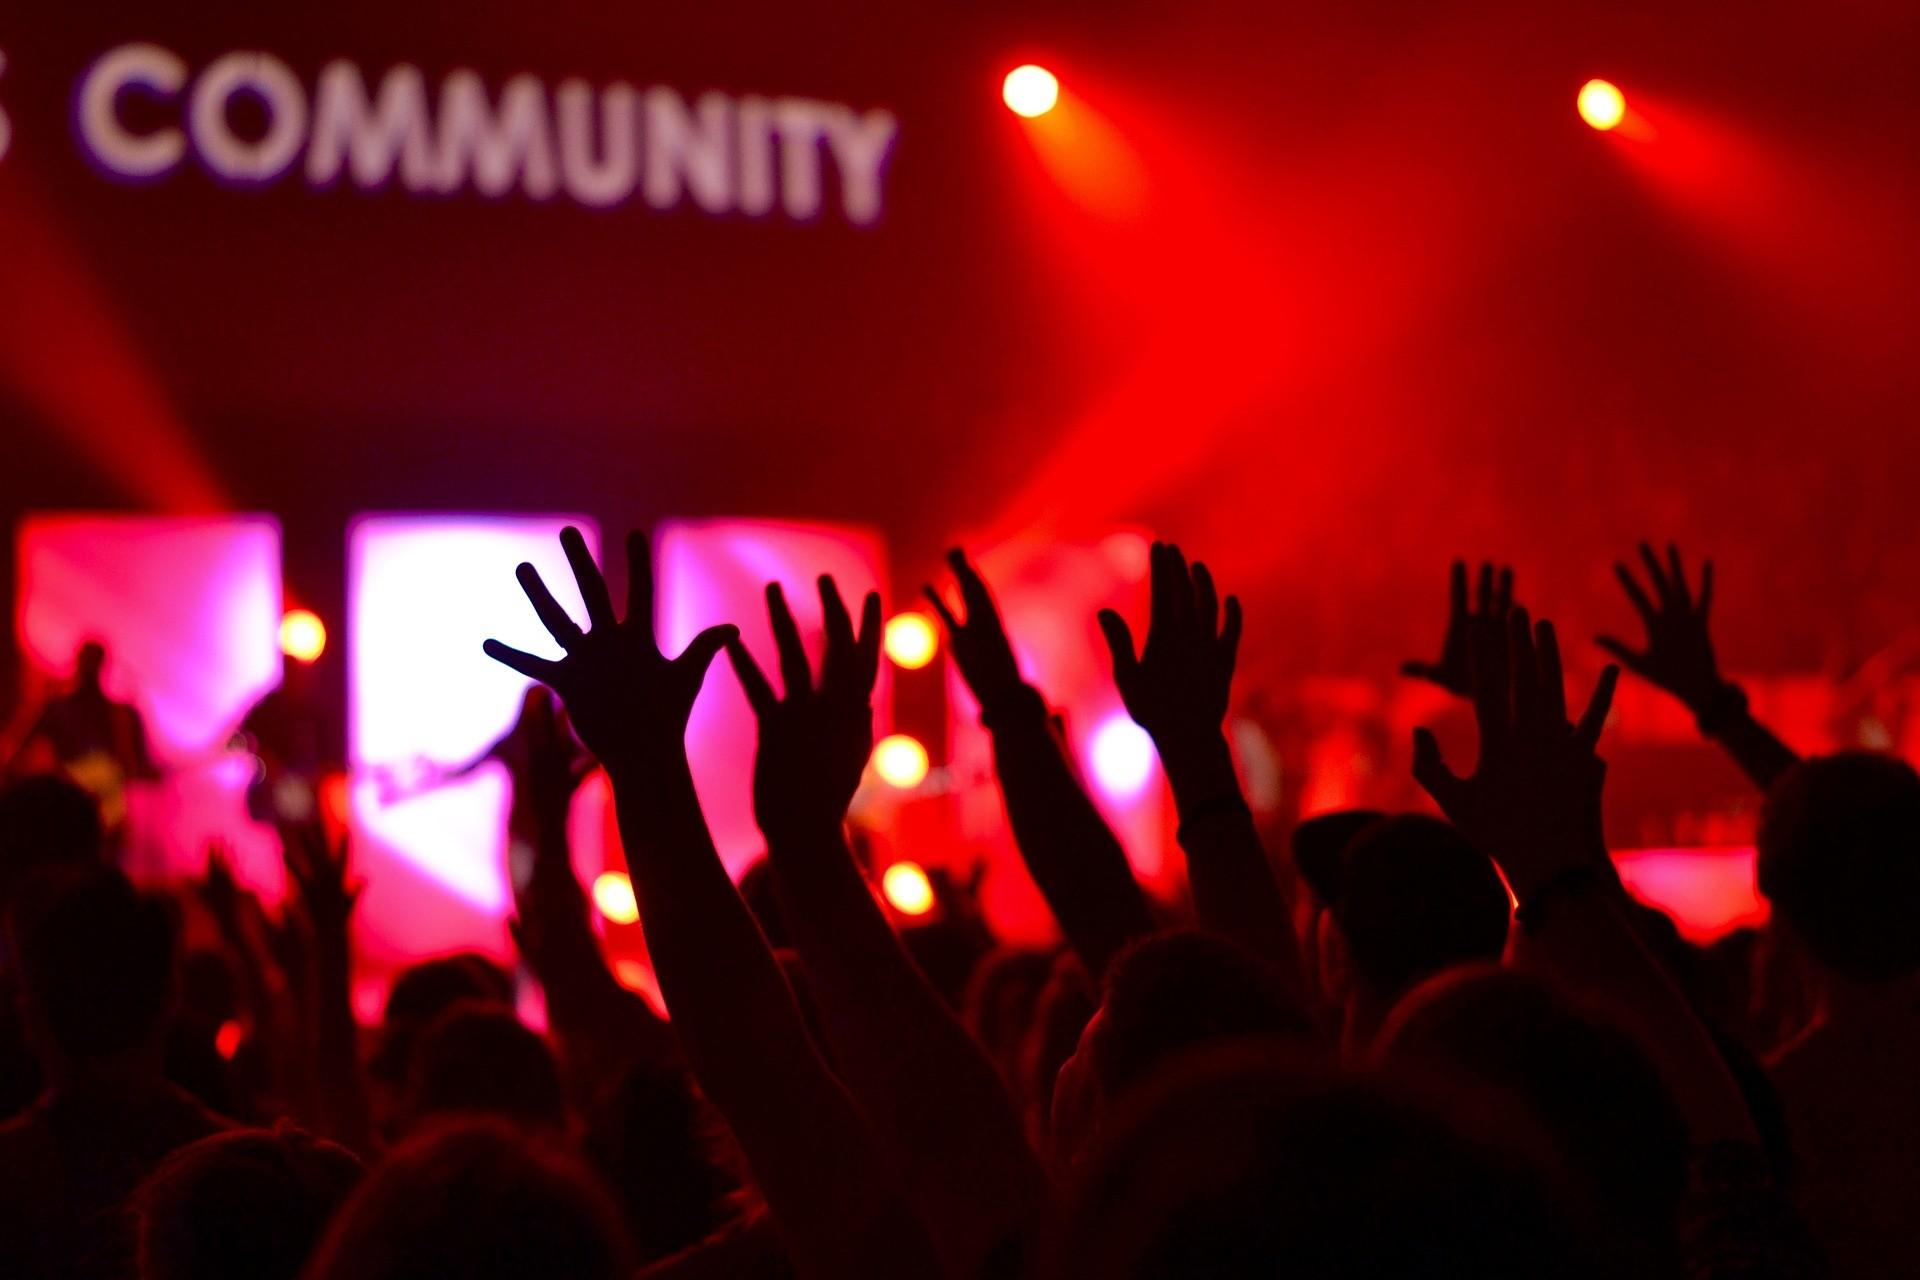 audience-945449_1920 (1)